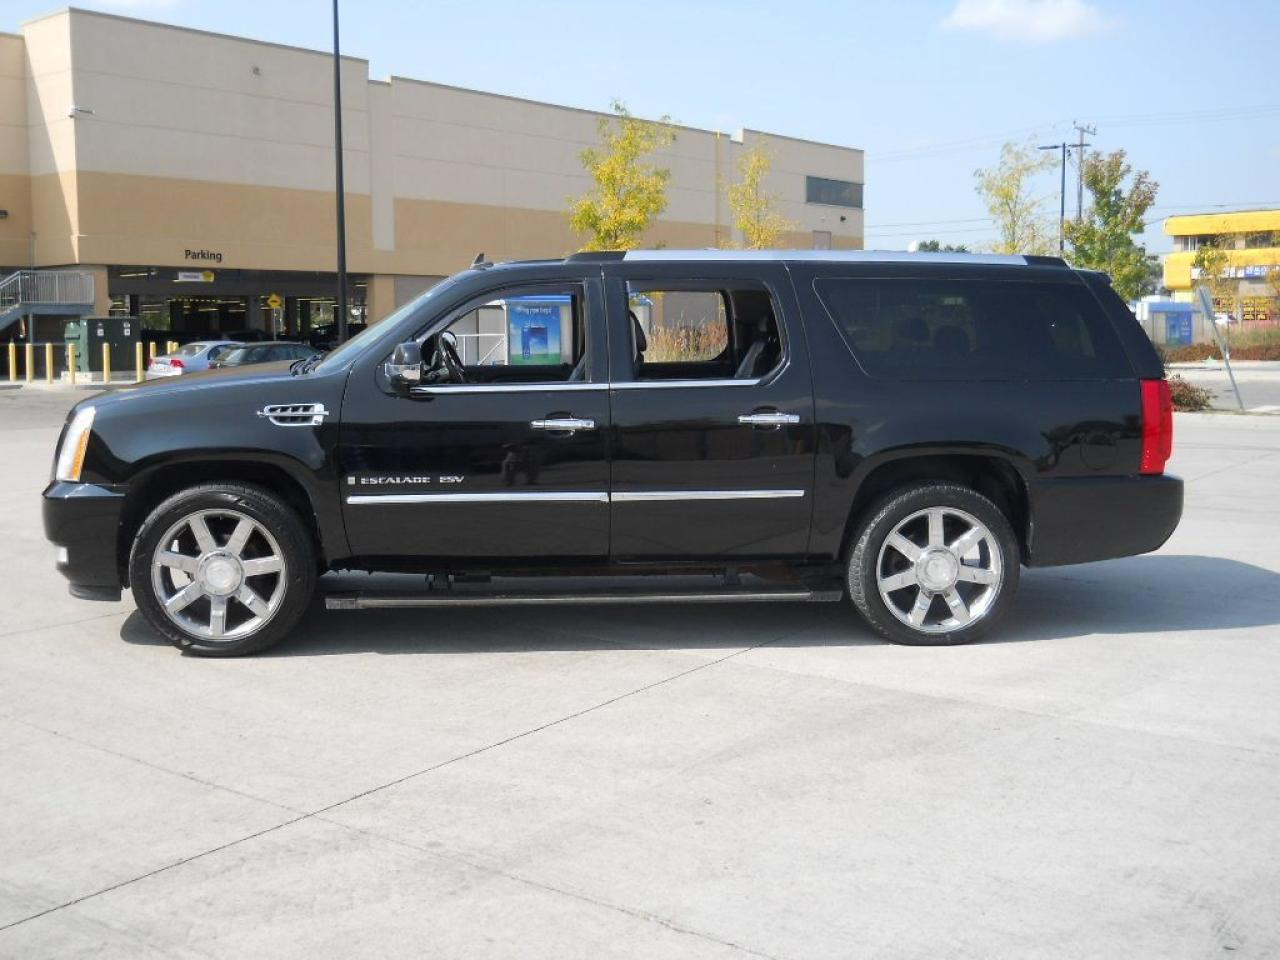 2008 Cadillac Escalade ESV PLATINUM, AWD,DVD, Leather, Sunroof,Top of